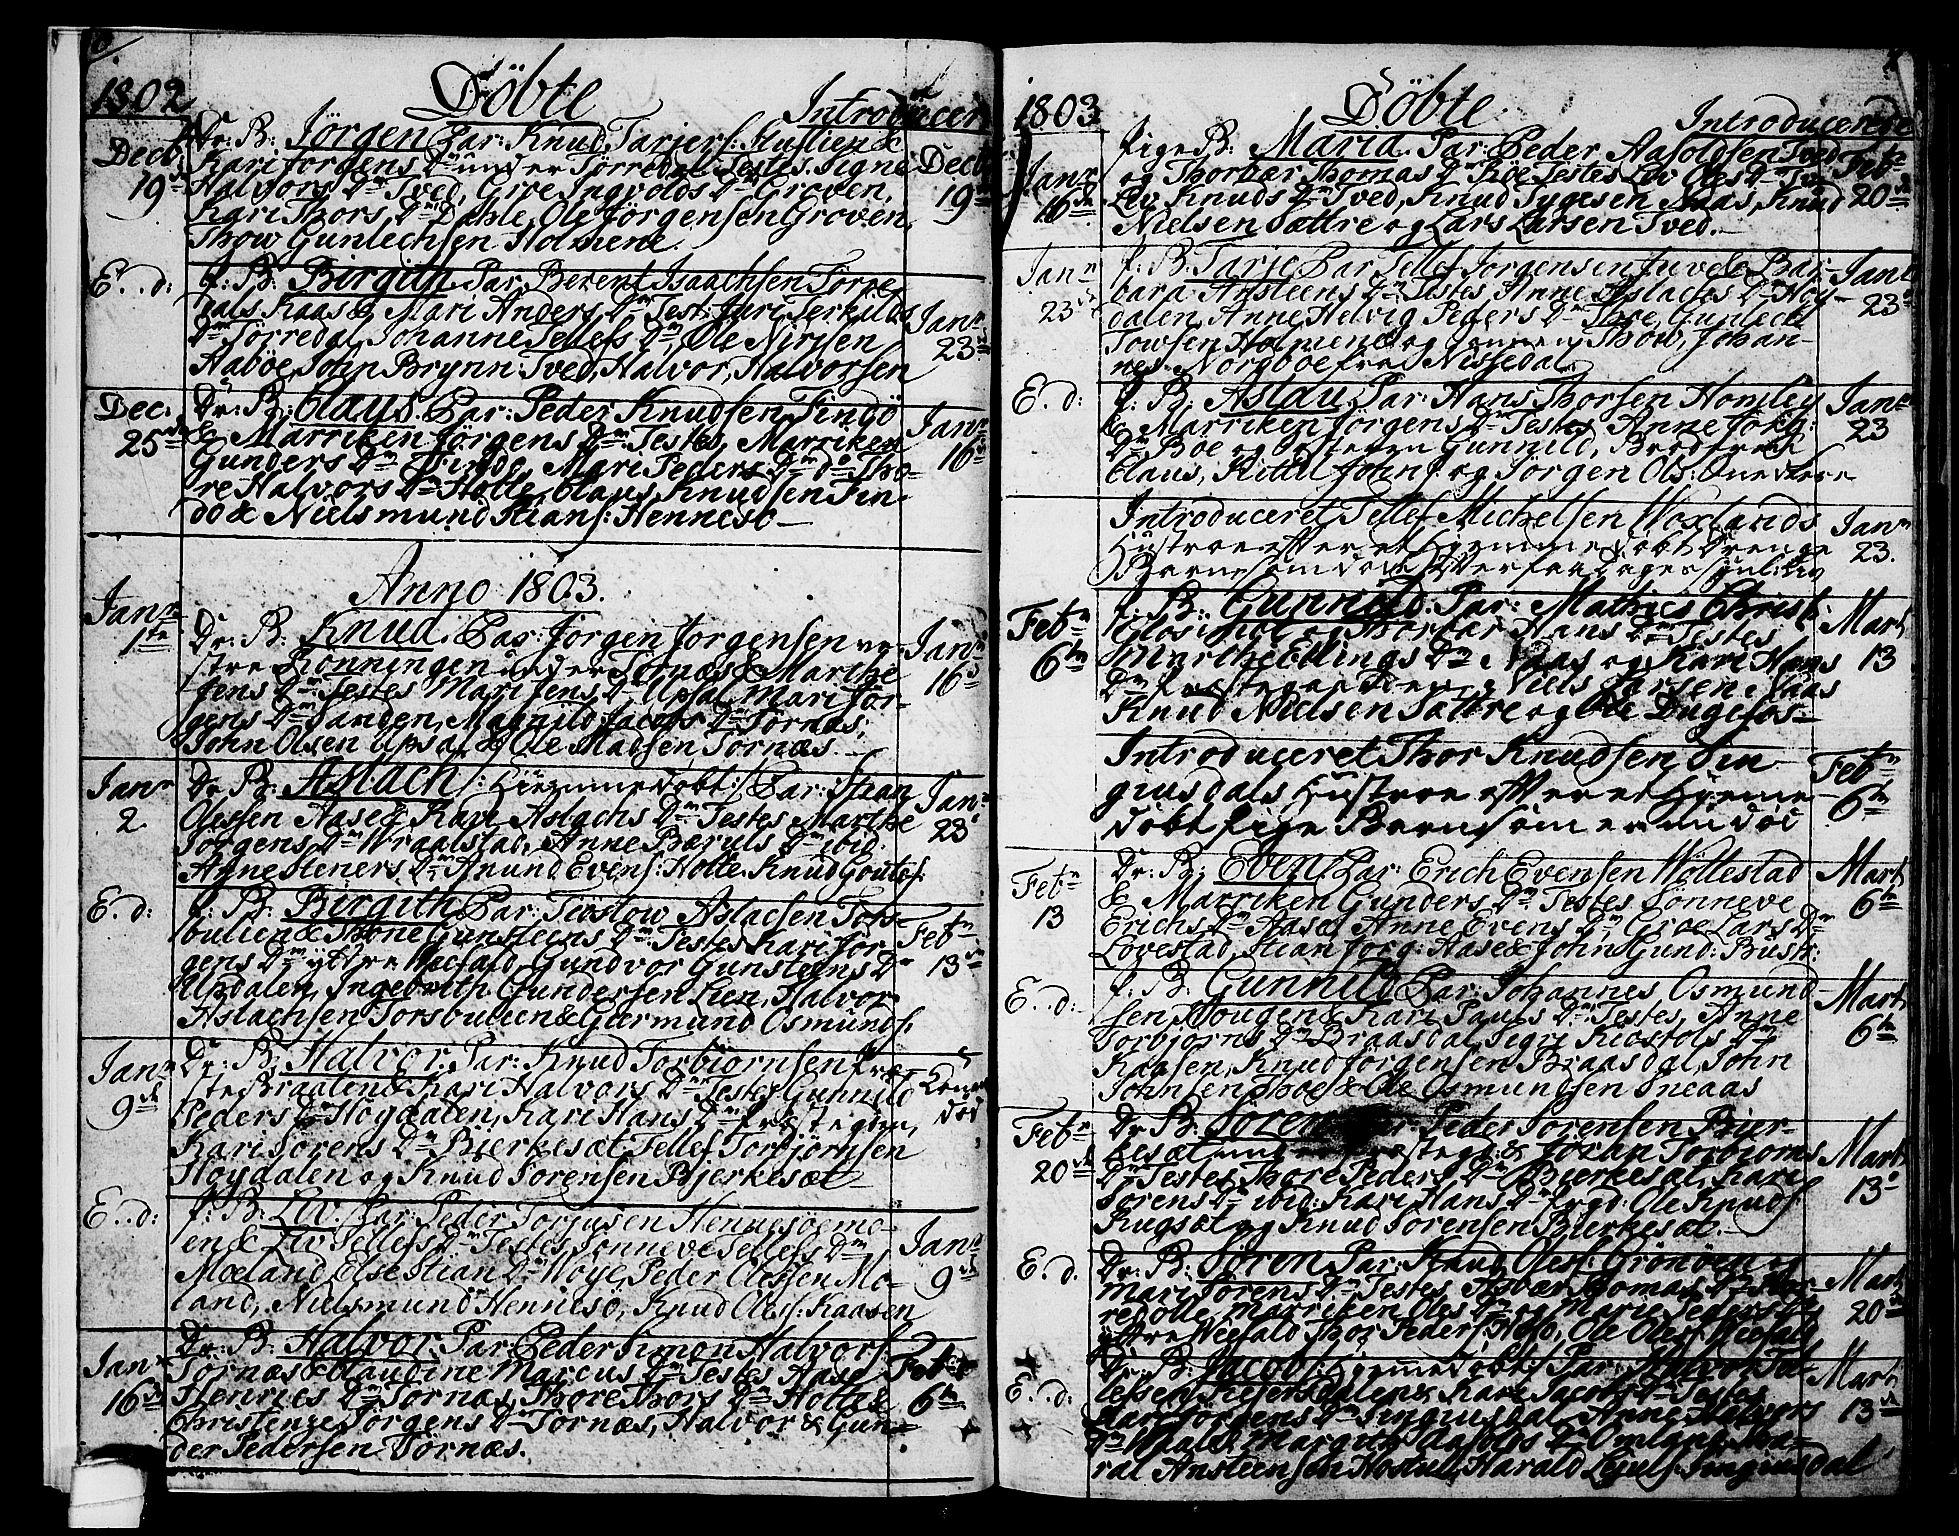 SAKO, Drangedal kirkebøker, F/Fa/L0004: Ministerialbok nr. 4, 1802-1814, s. 6-7